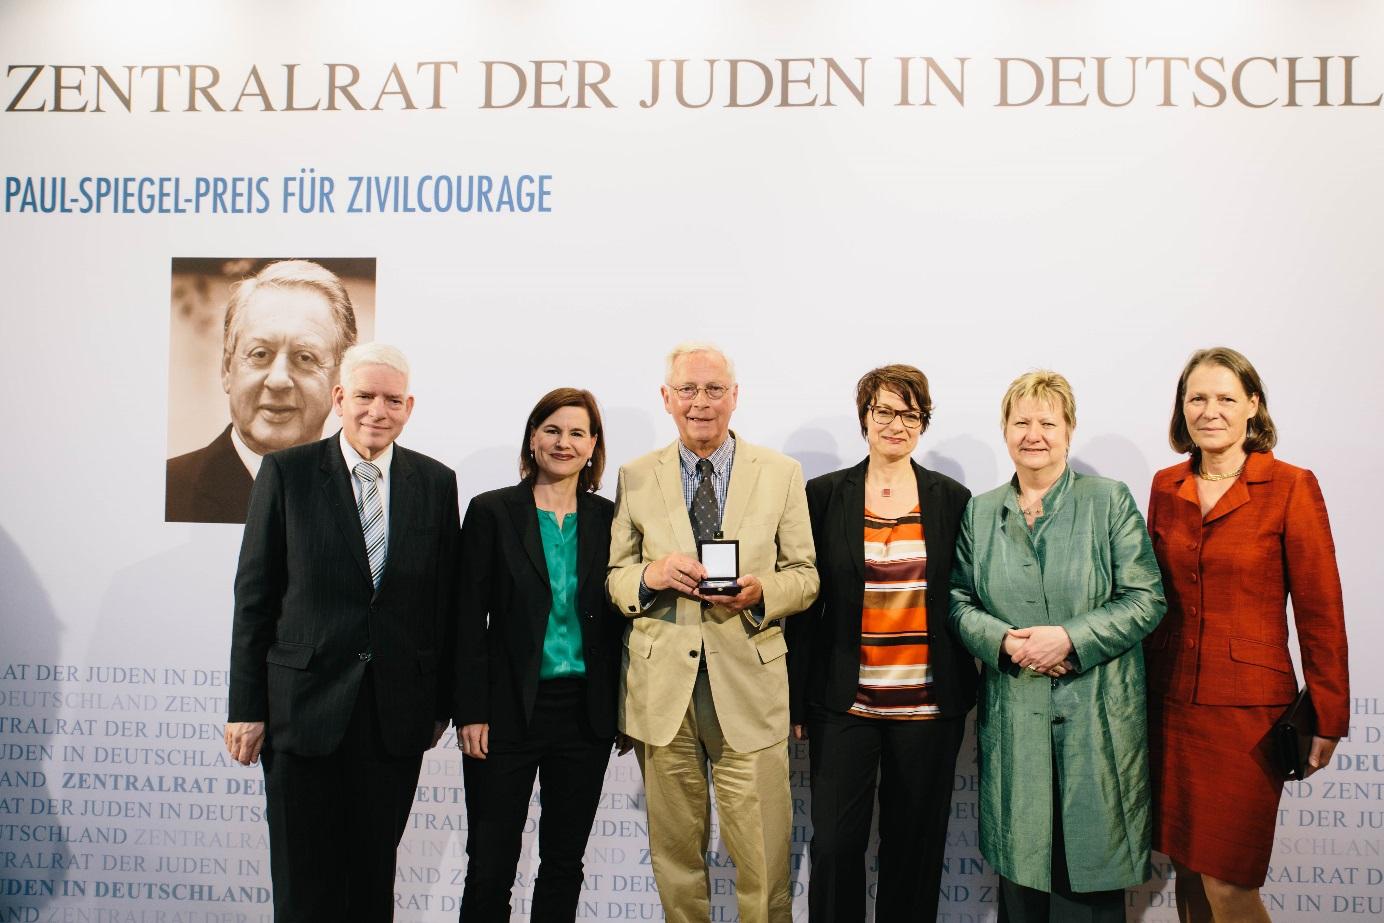 v.l. Dr. Josef Schuster, Sophia Oppermann, Uwe-Karsten Heye, Rebecca Weis, Sylvia Löhrmann, Christina Rau